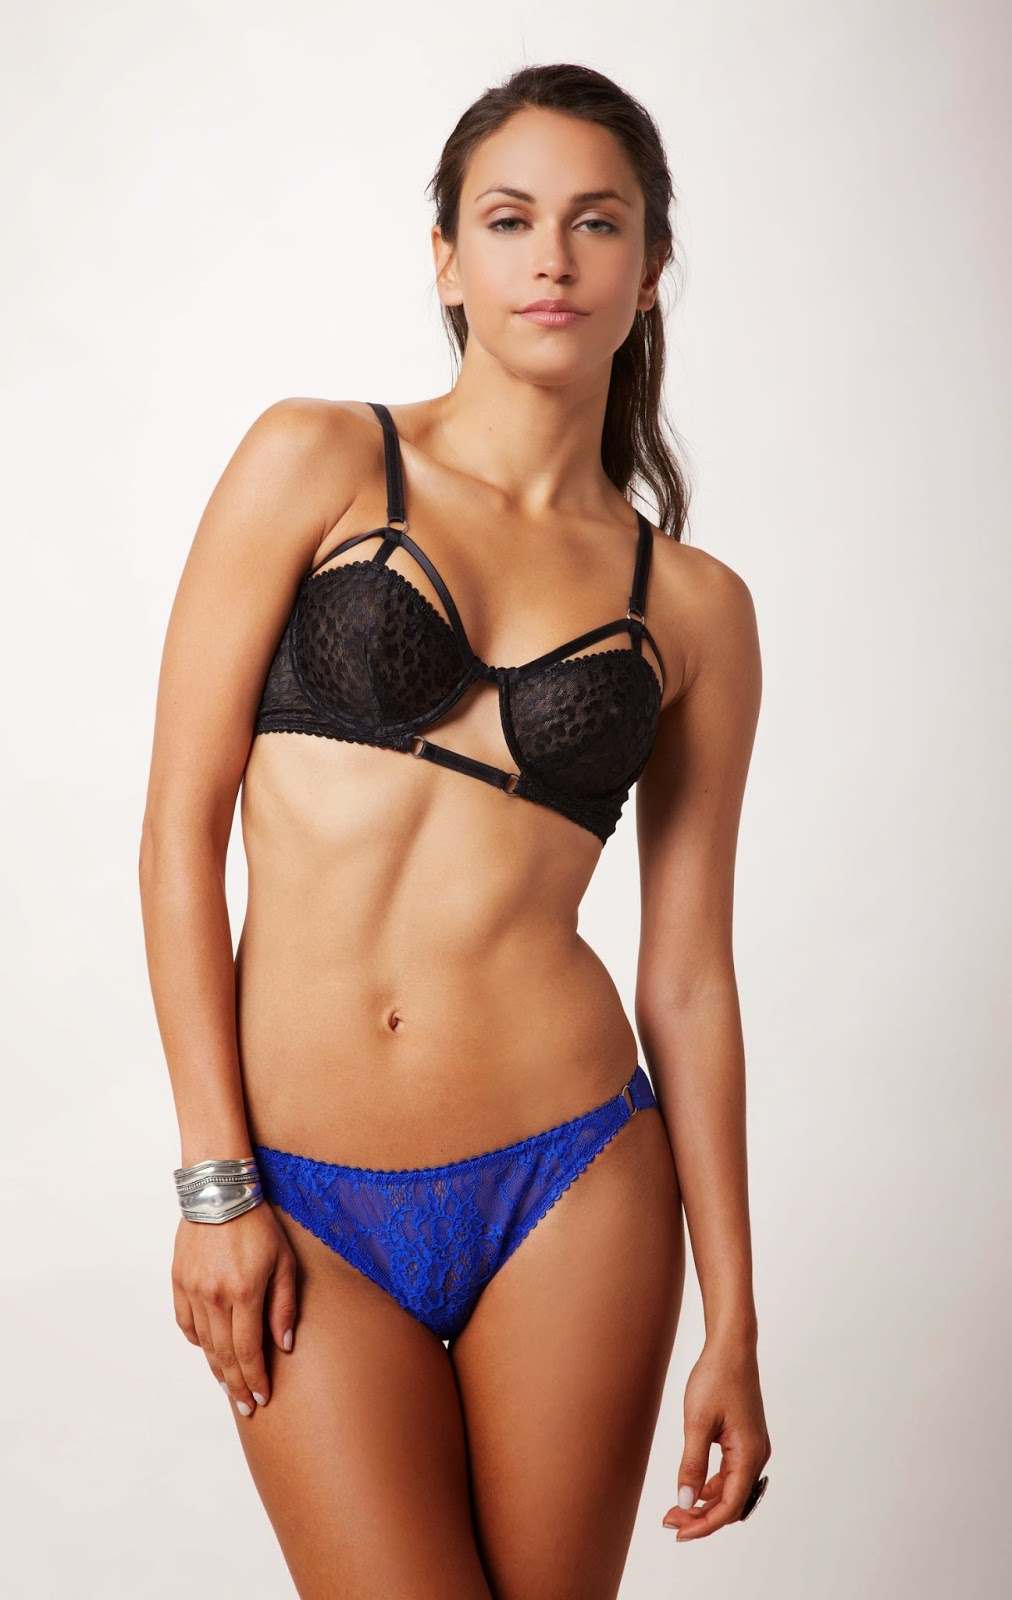 Asha Leo in a bikini